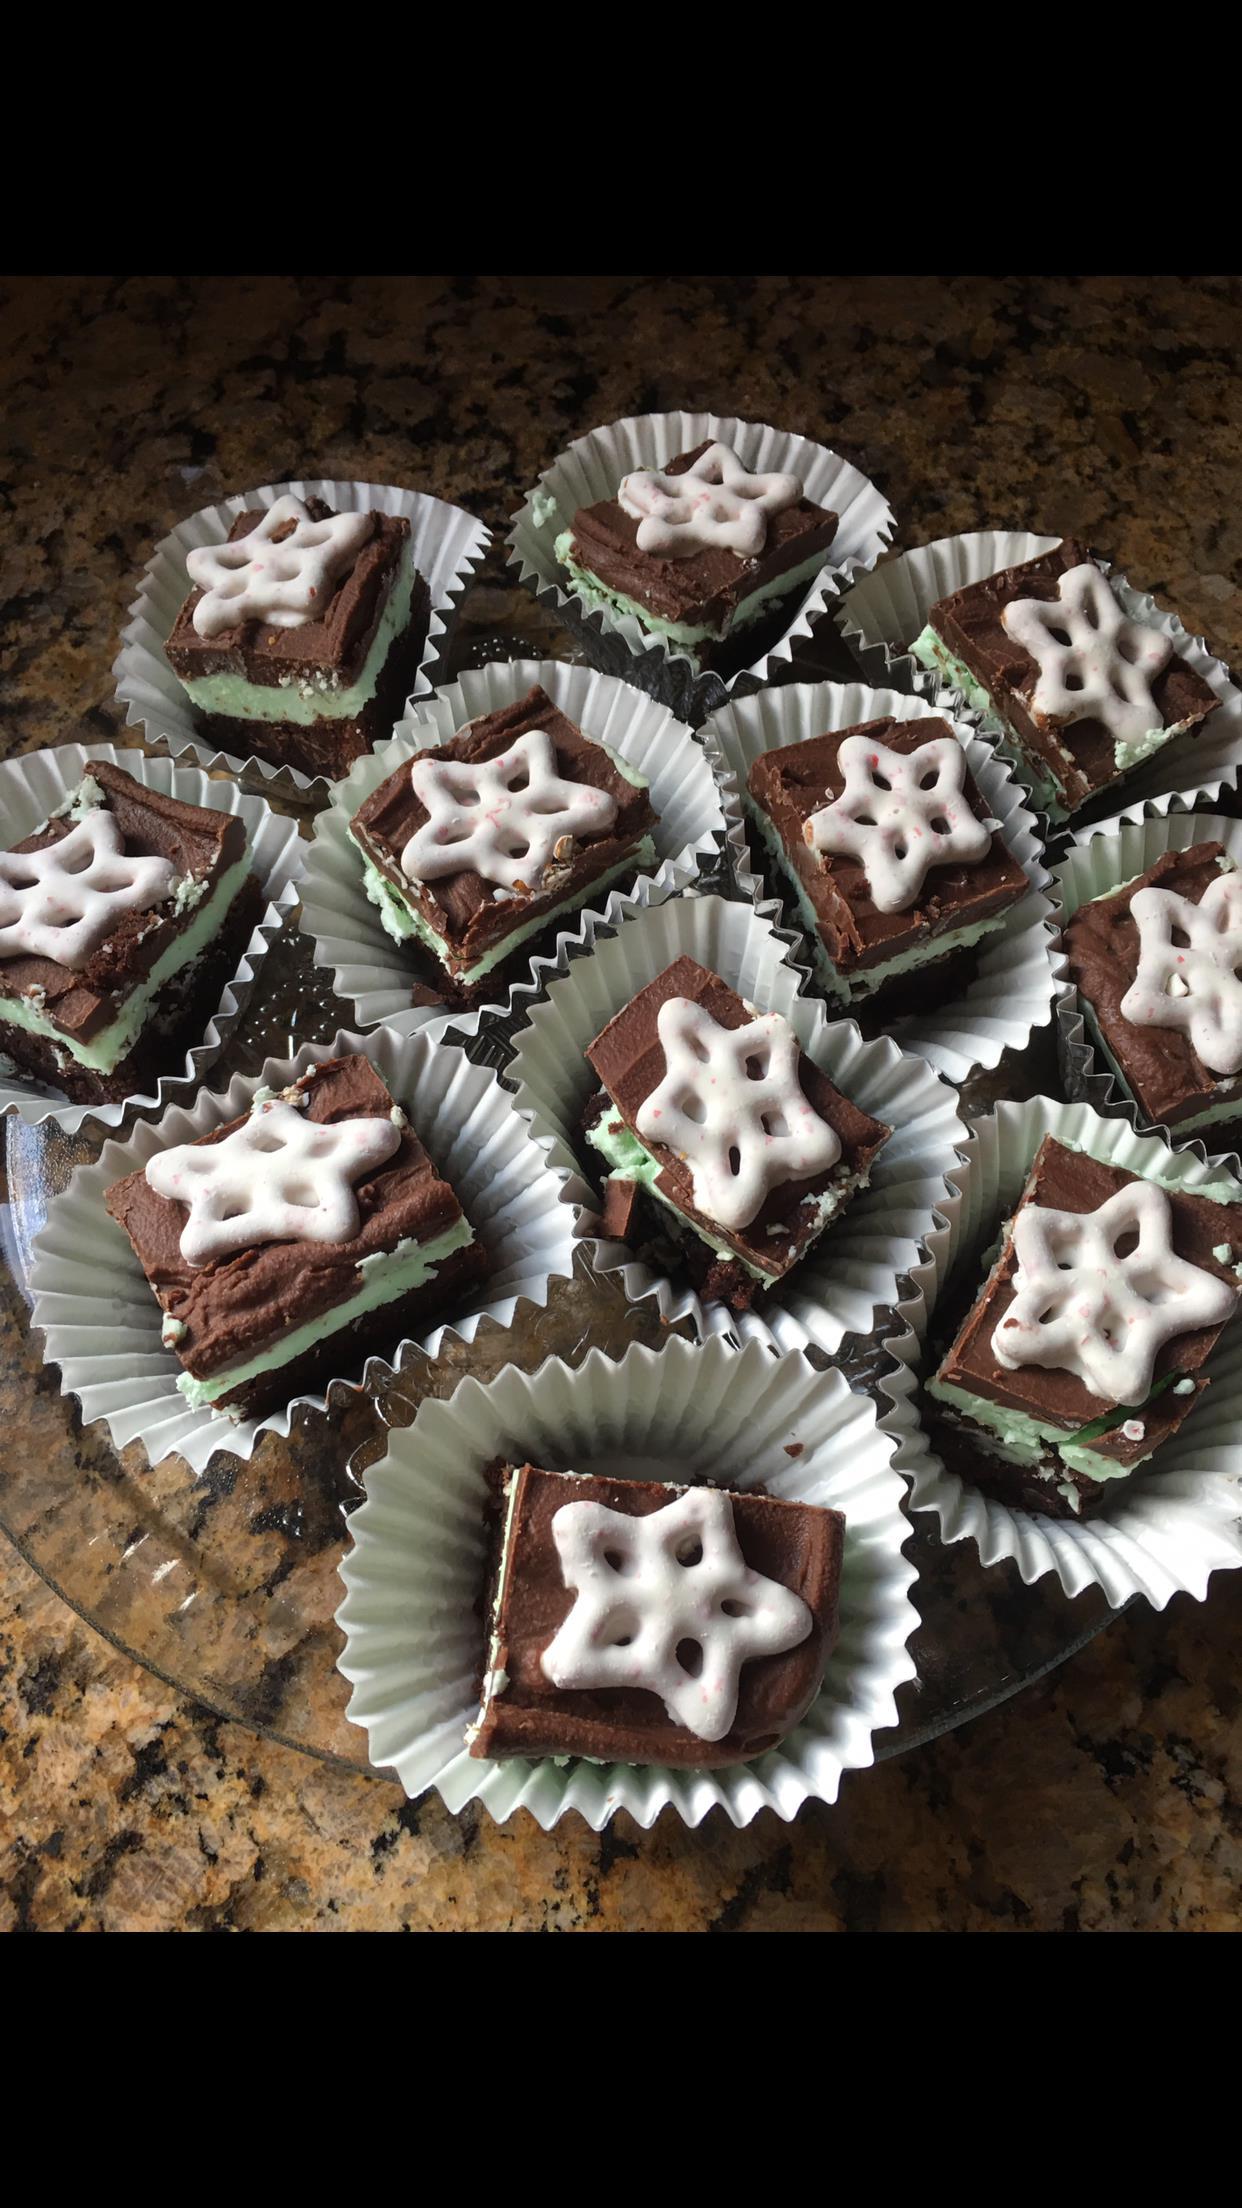 Chocolate Mint Dessert Brownies